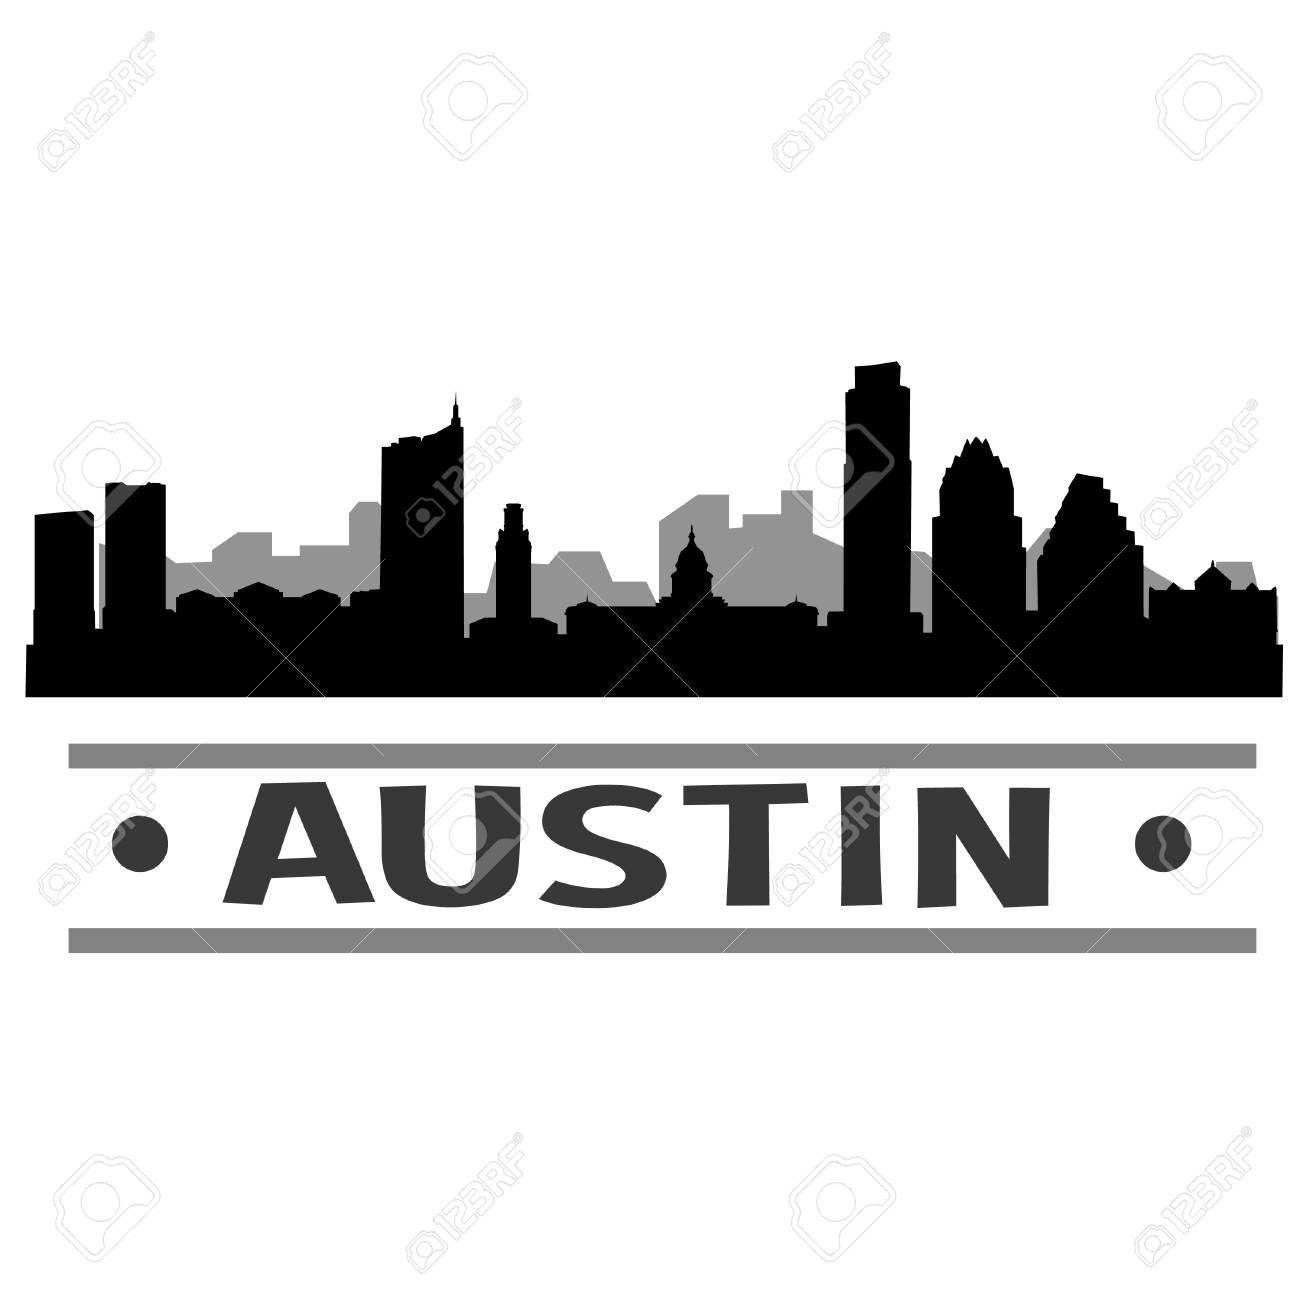 Austin Skyline Vector Art City Design.